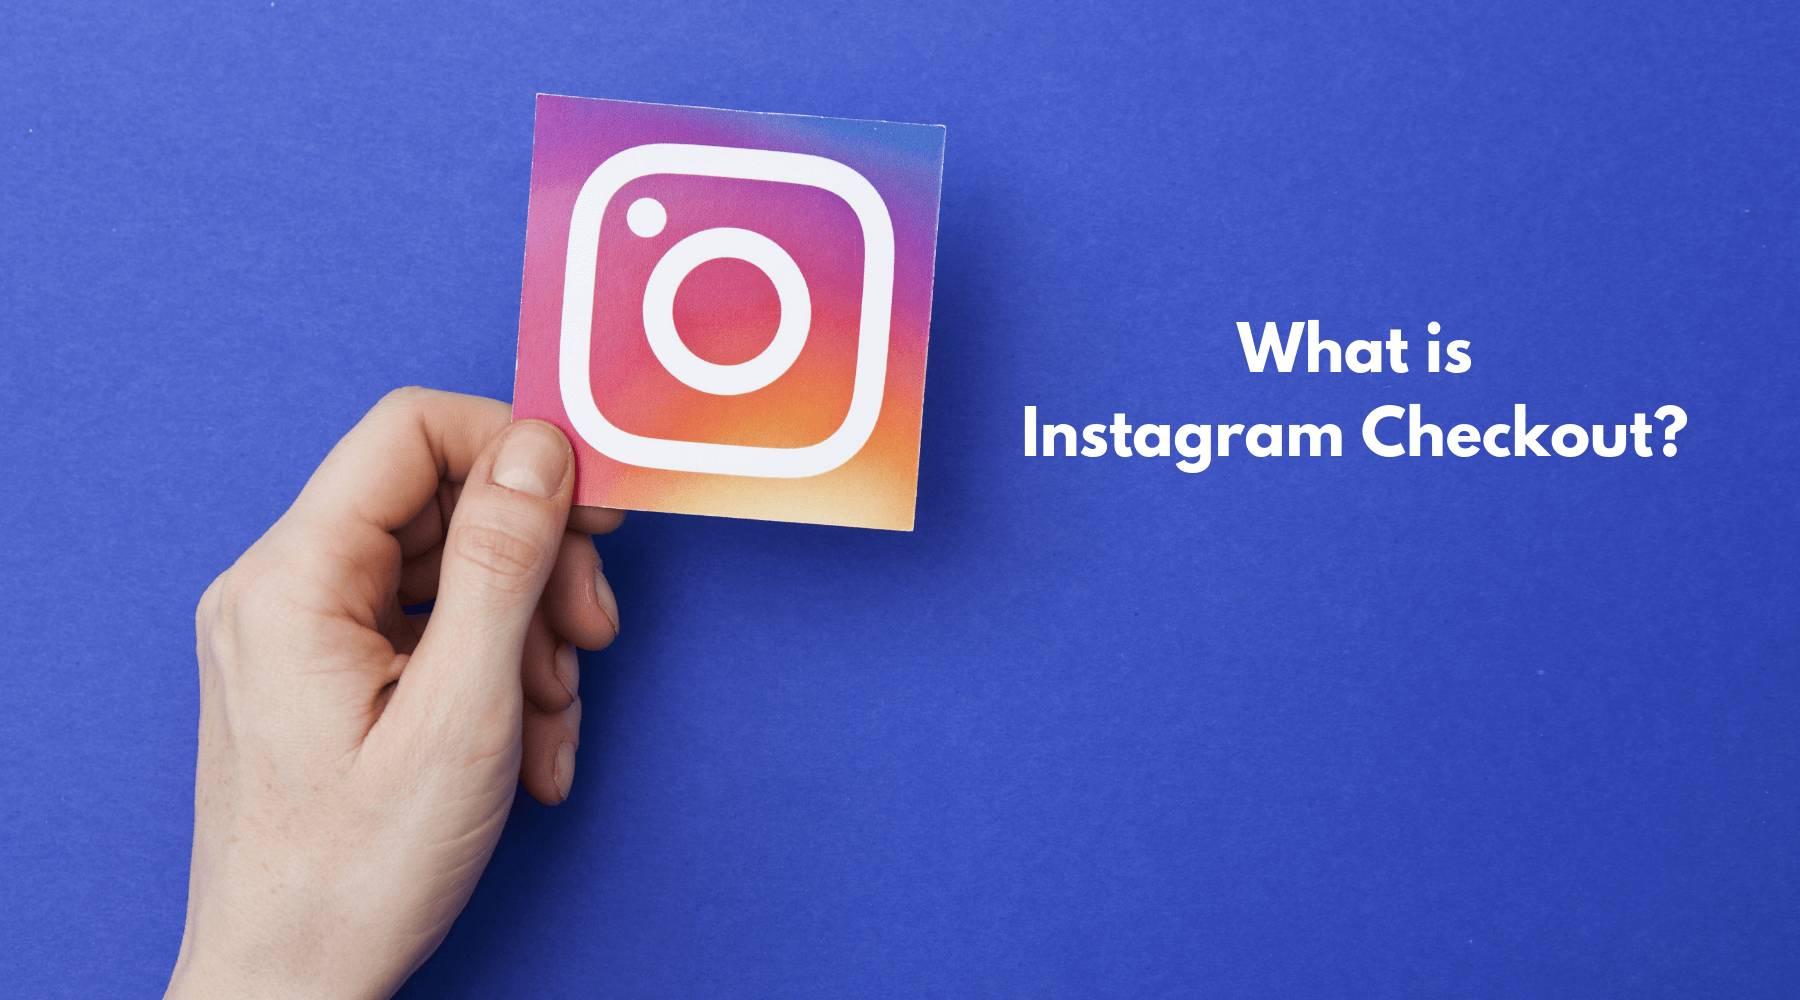 InstagramCheckoutευκαιρίαγιαταeCommercebrandsτοiTrustDigital